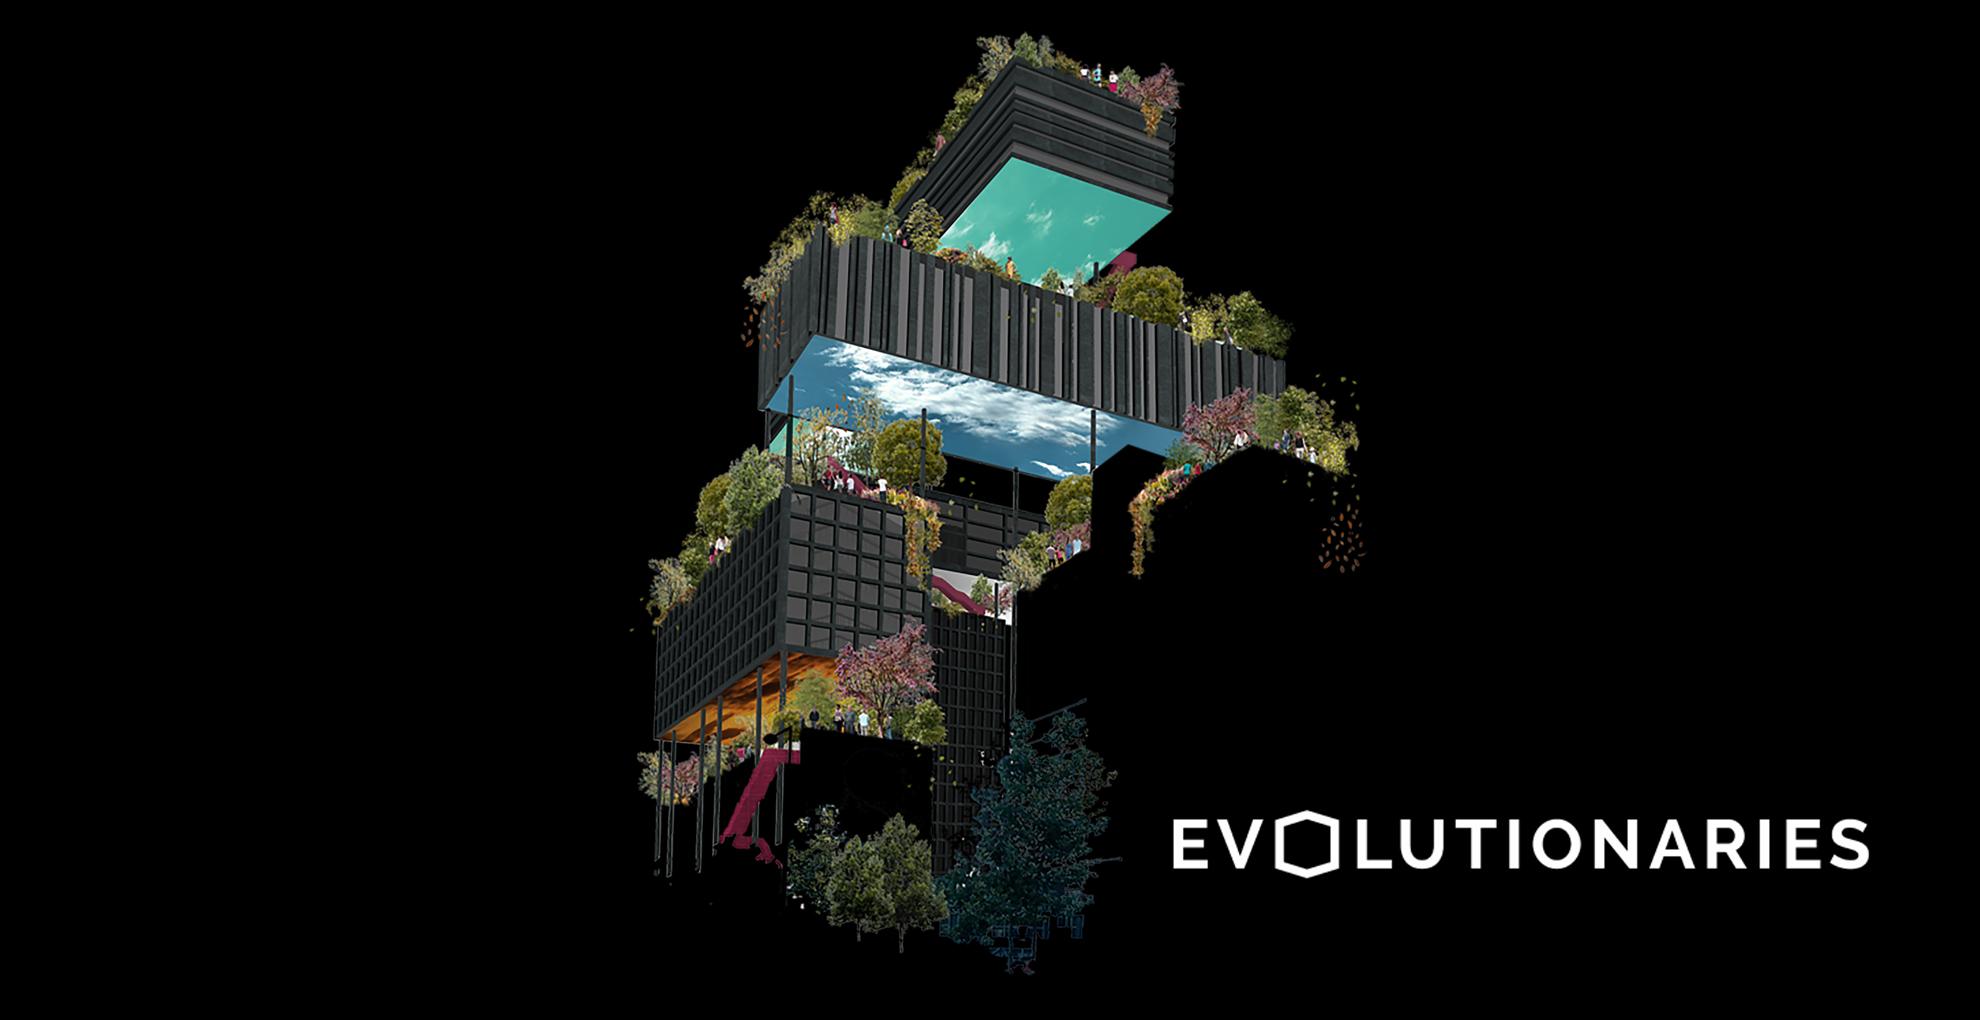 Evolutionaries 2